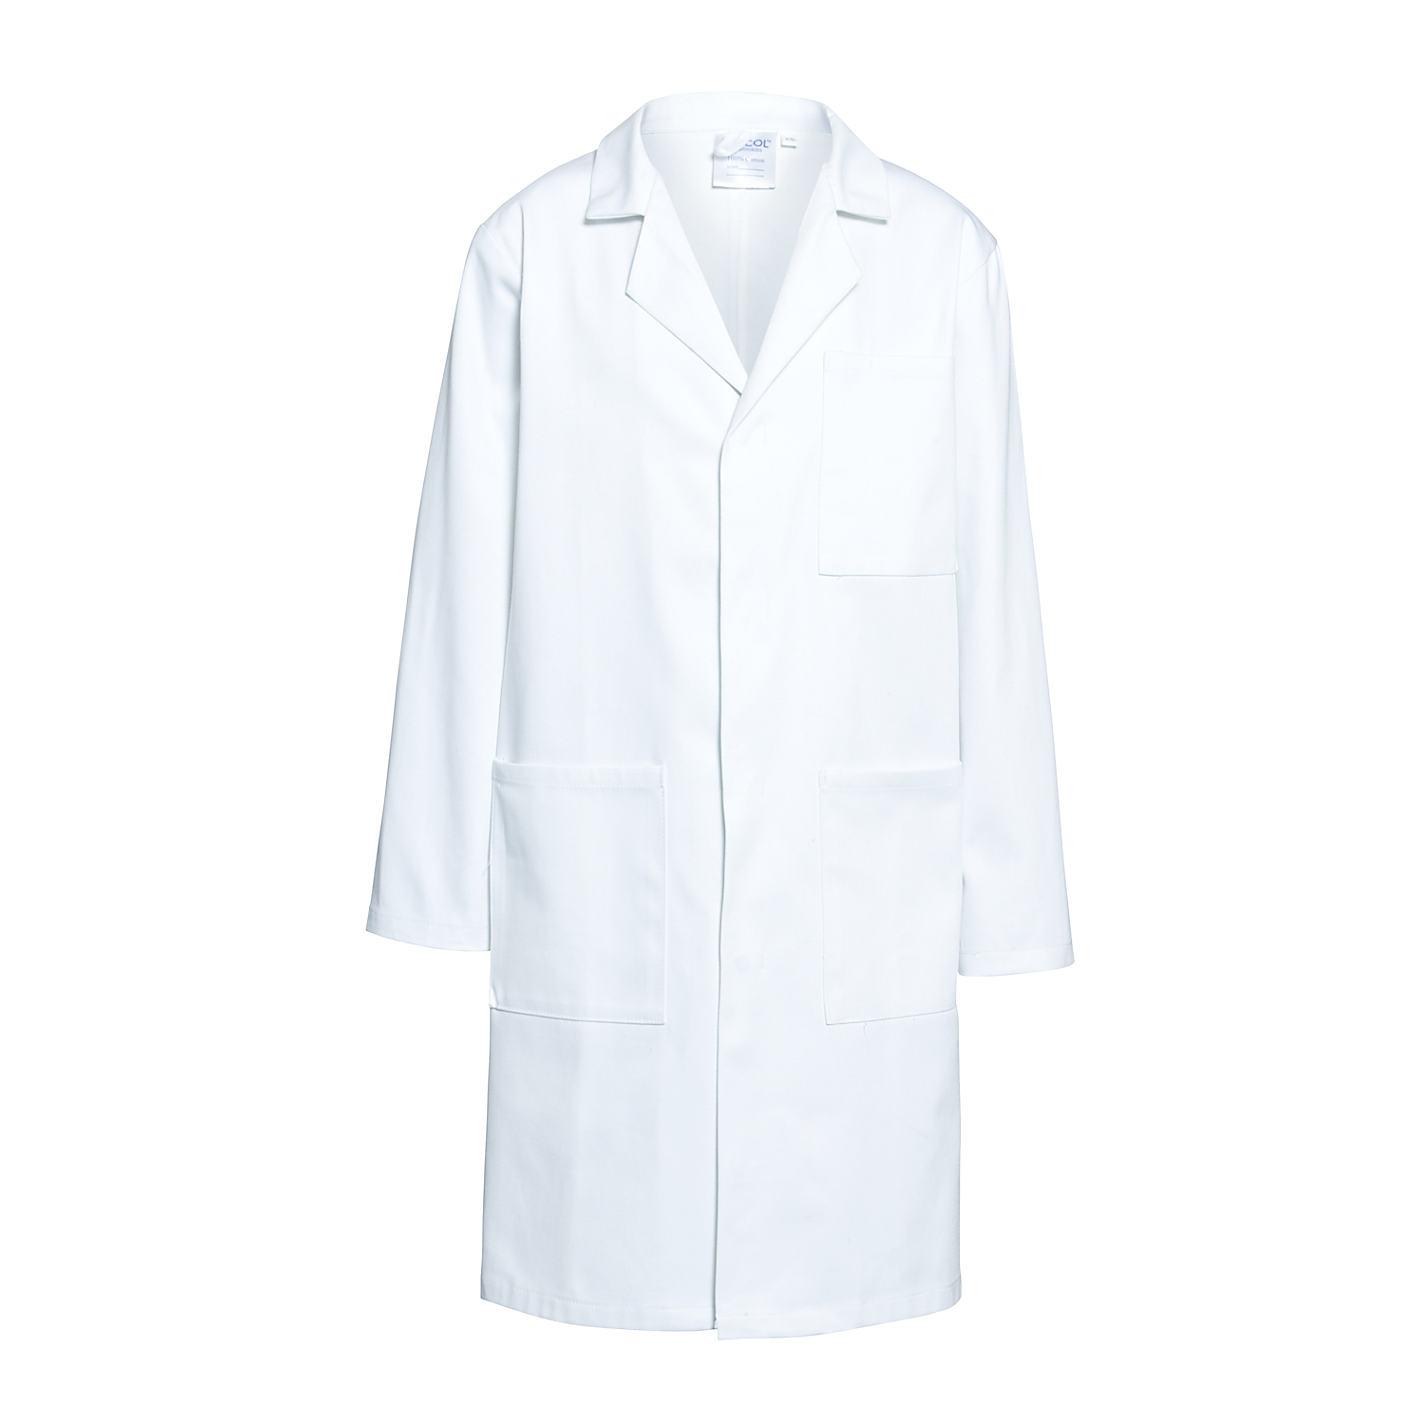 White apron john lewis - Buy William Turner Lab Coat White Online At Johnlewis Com